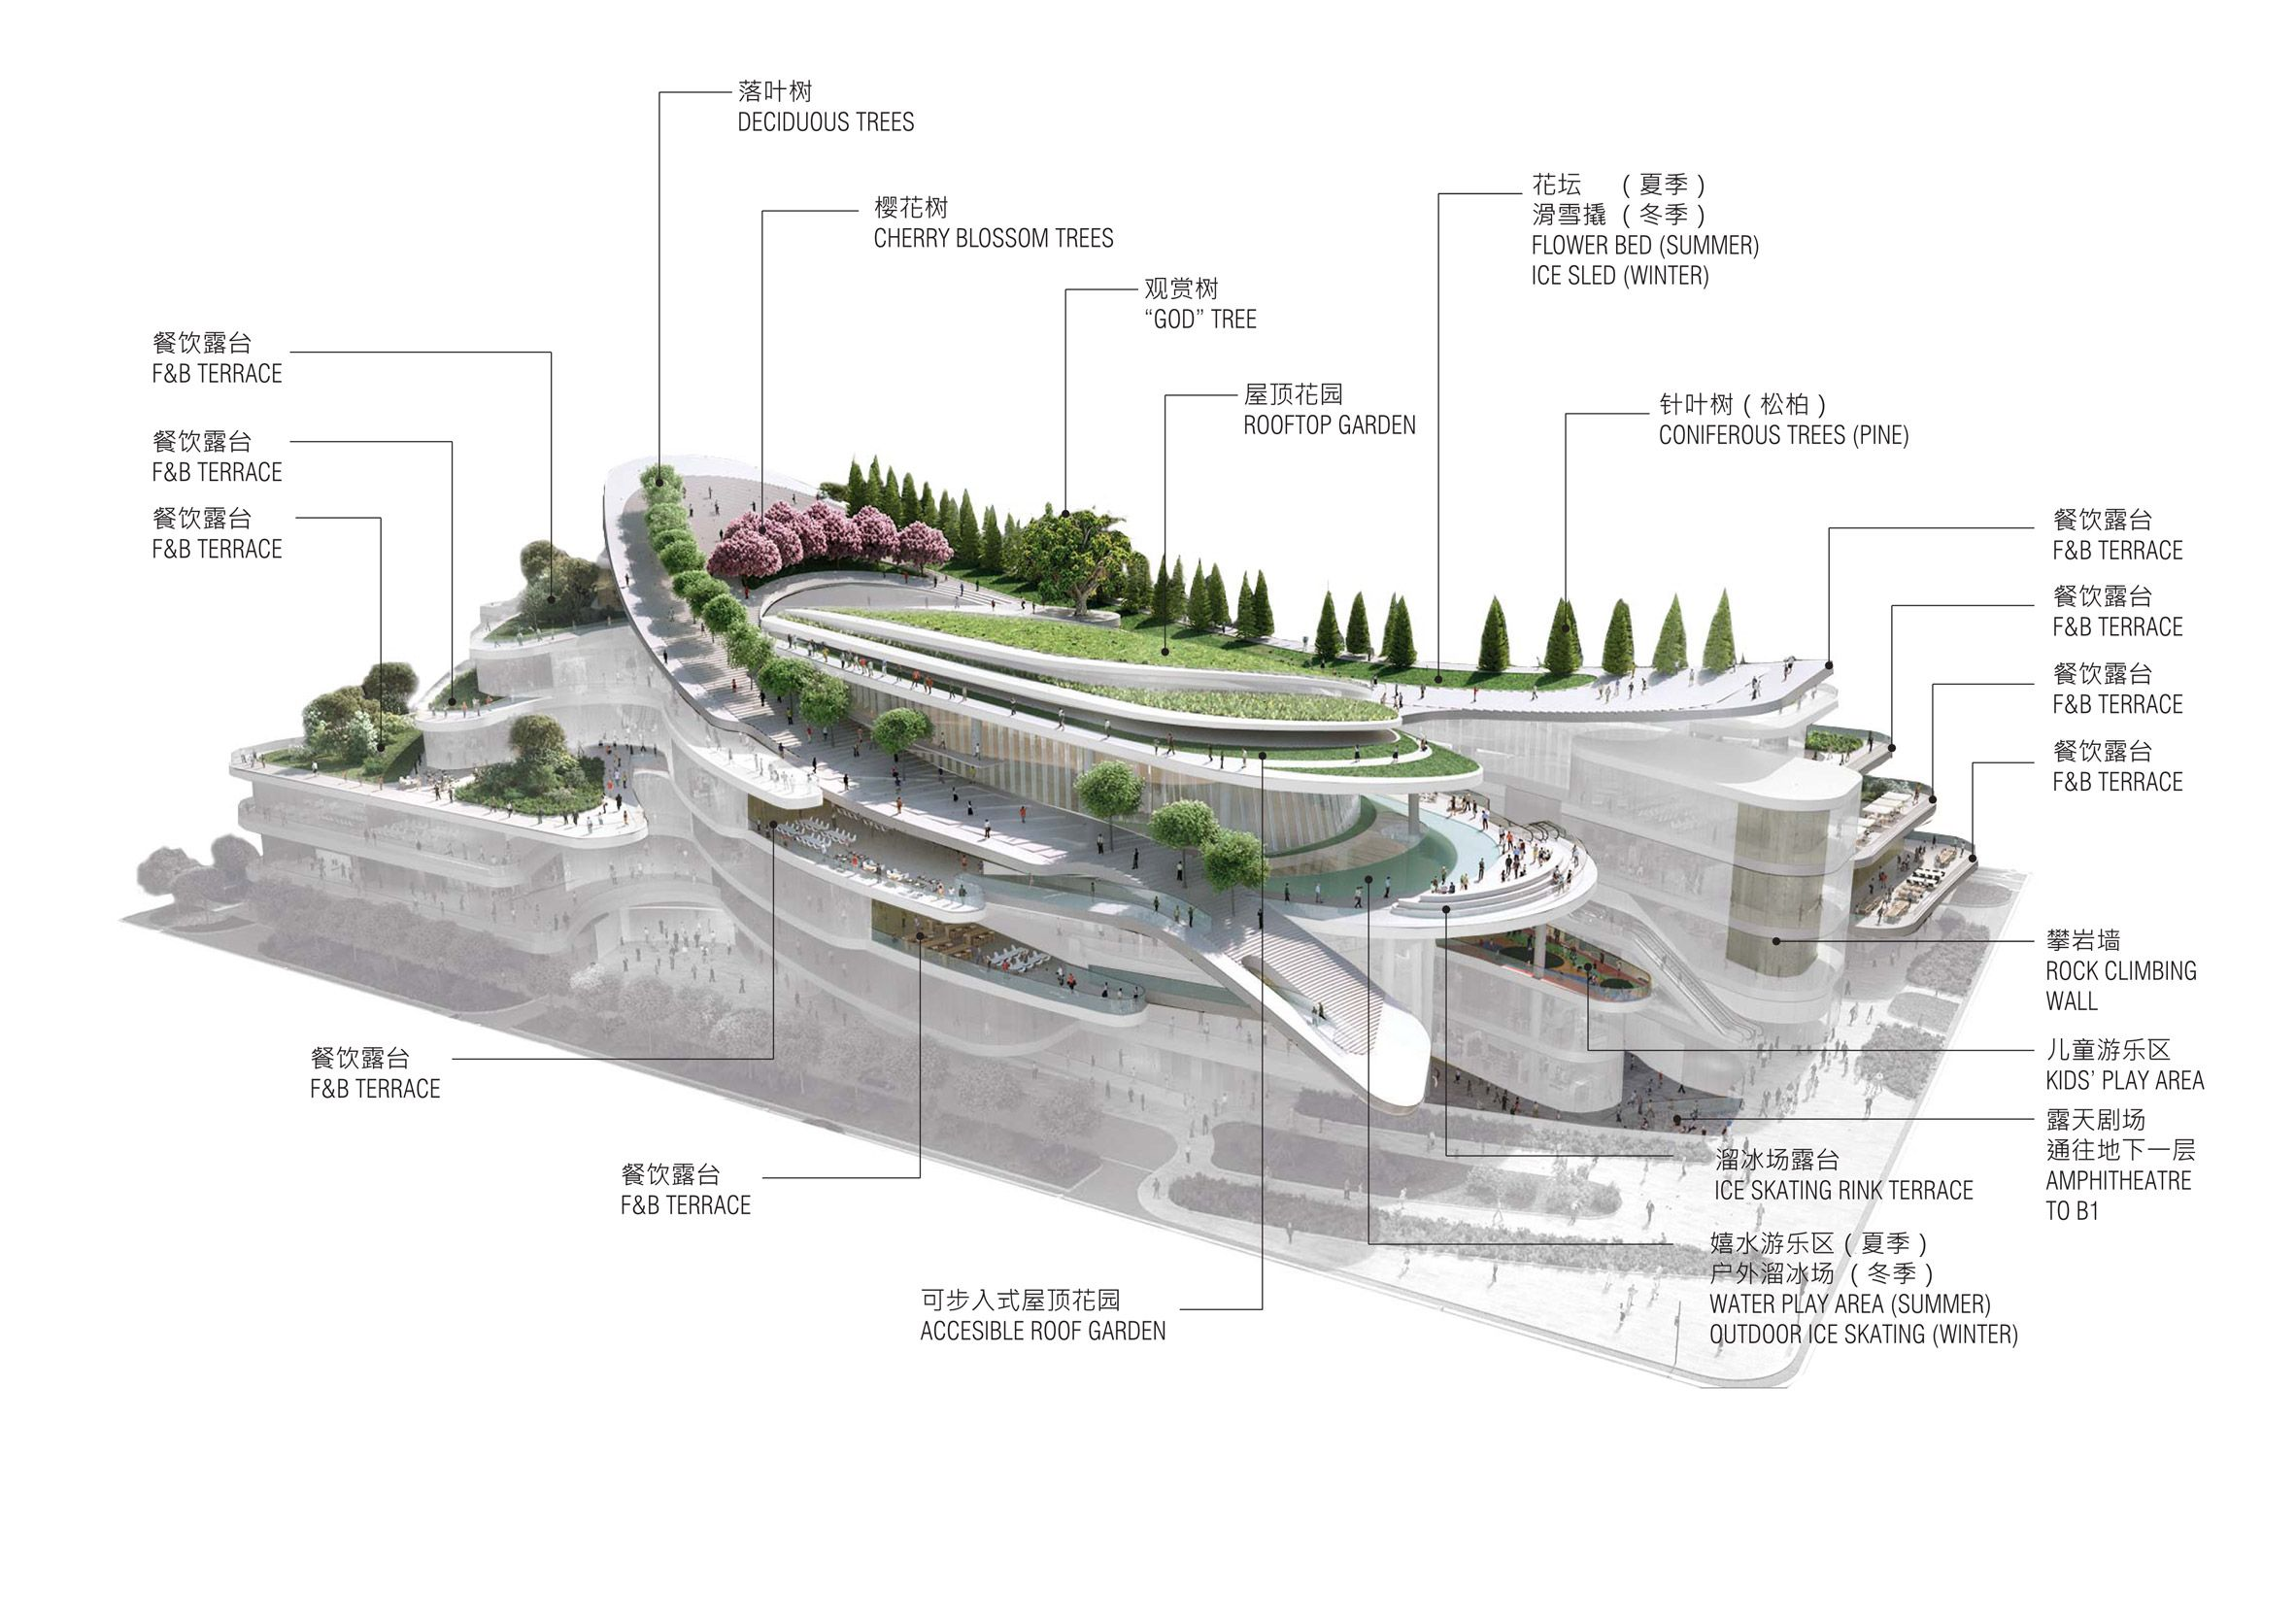 sledding path to loop around roof garden of beijing civic centre